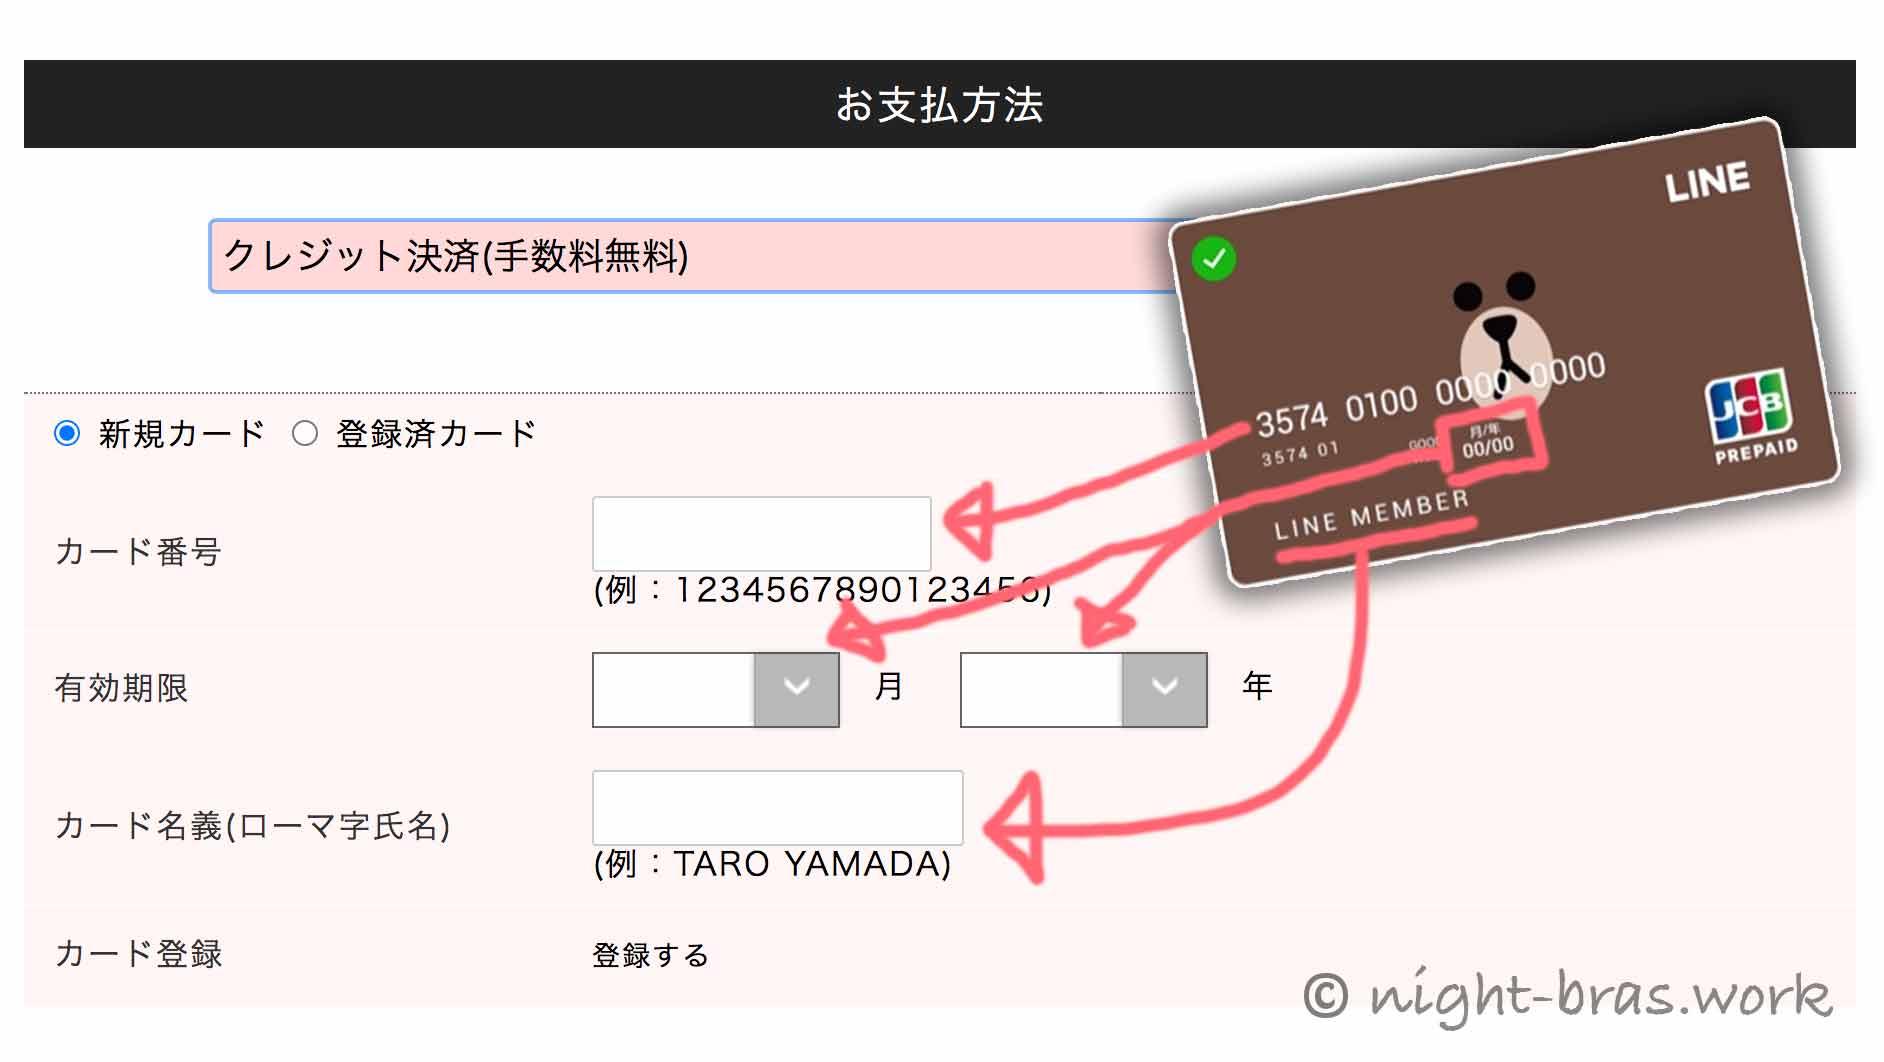 LINE Pay カードでモテフィット買う手順<カードに書かれた番号を入力>